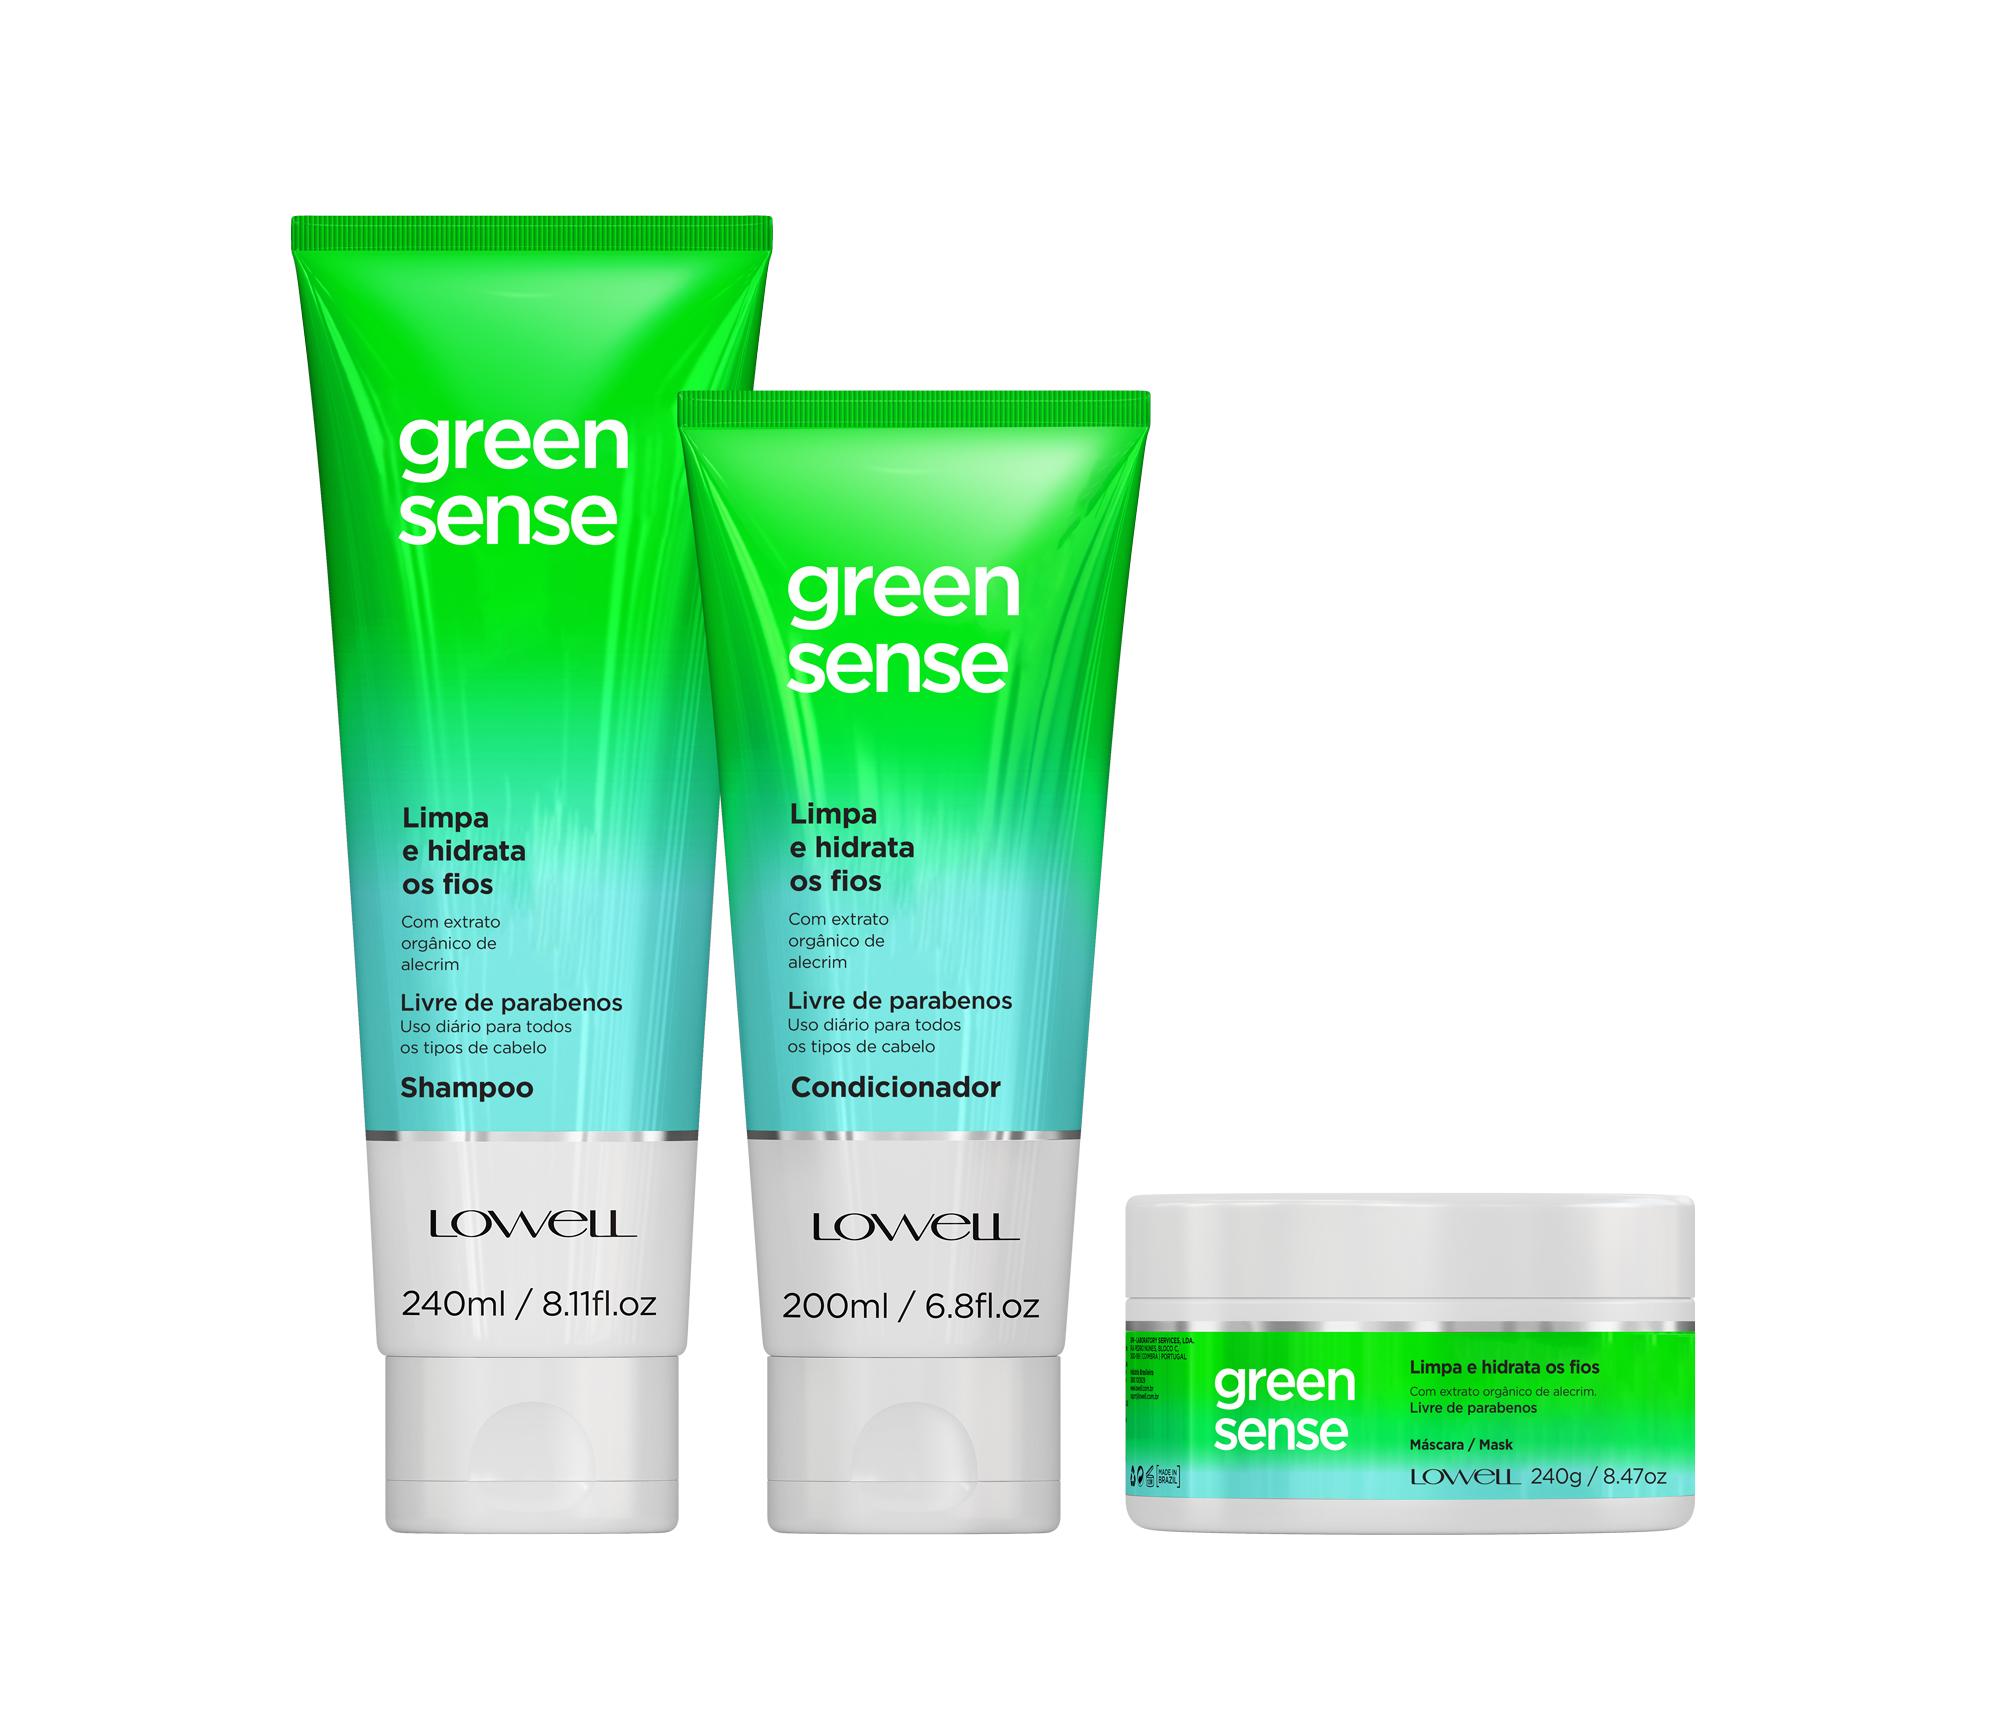 Lowell Green Sense